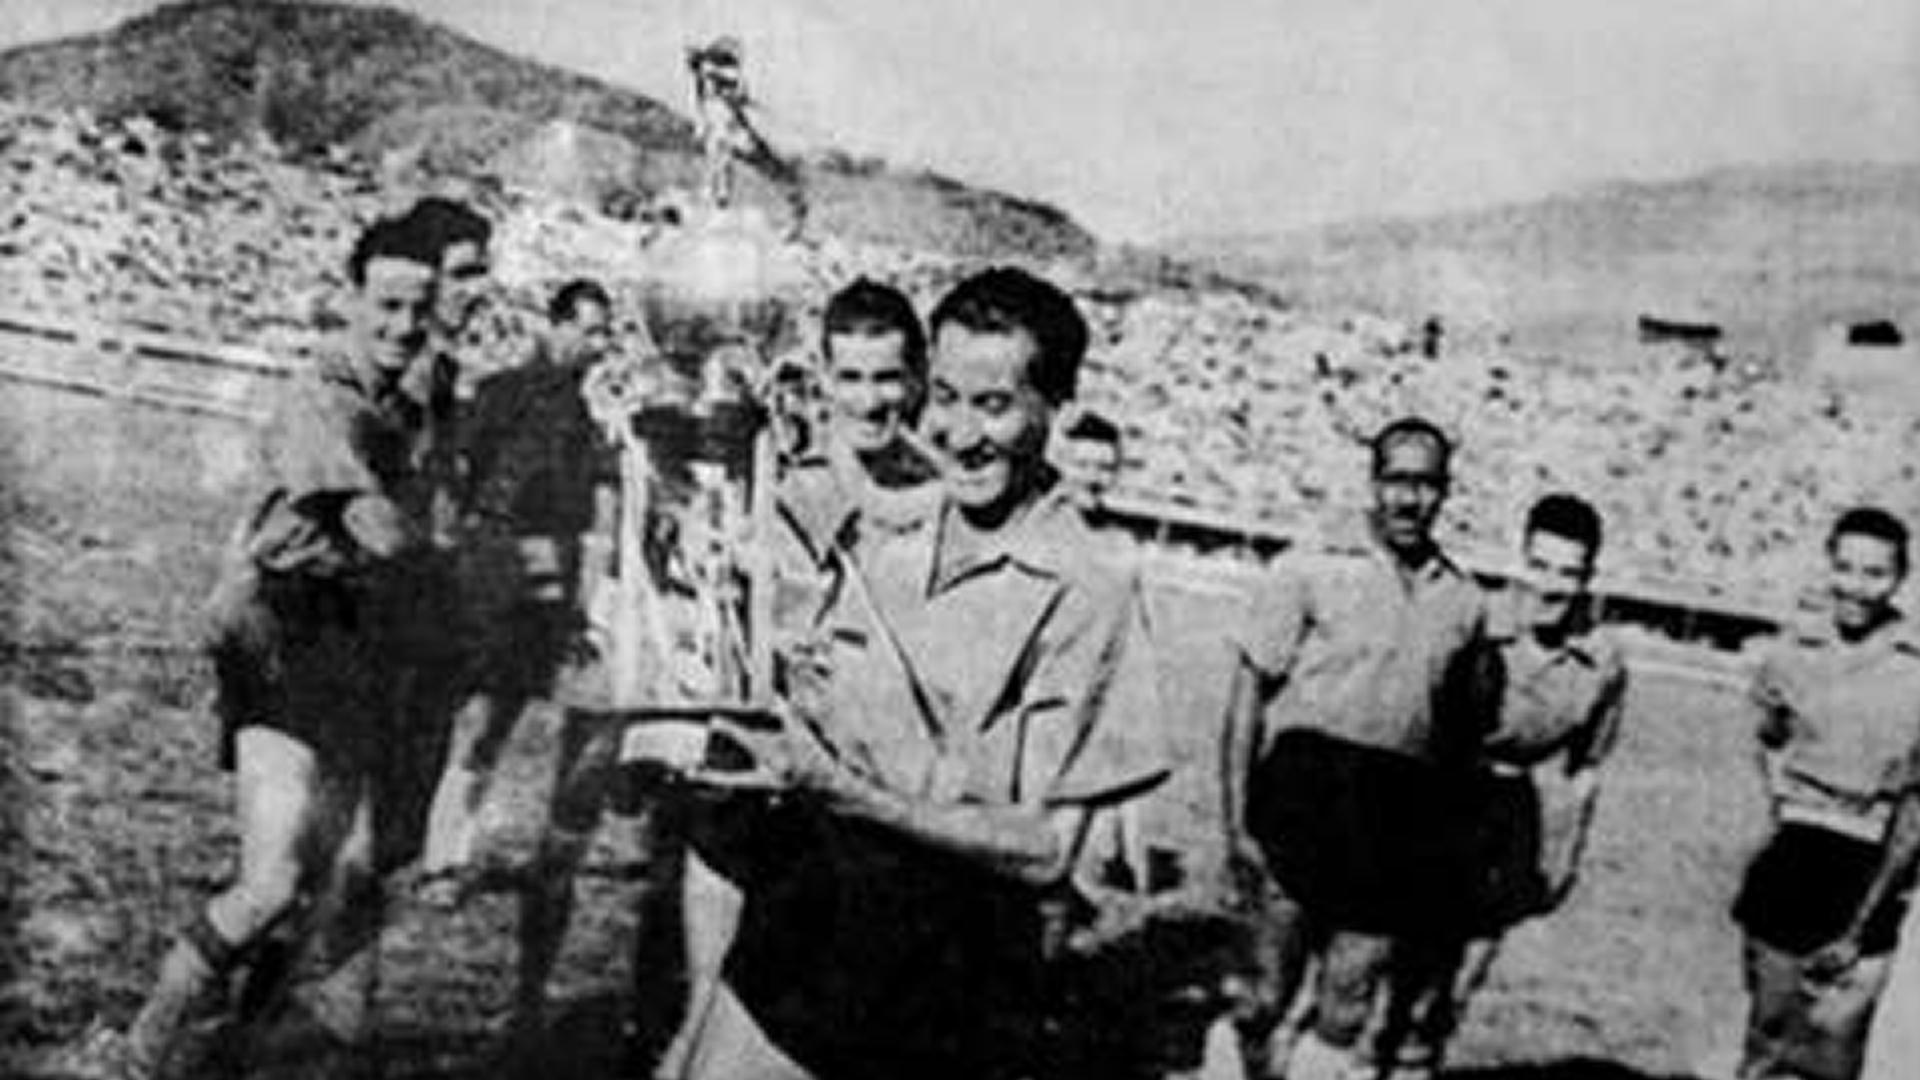 Humberto Turron Alvarez Atlético Nacional 1954